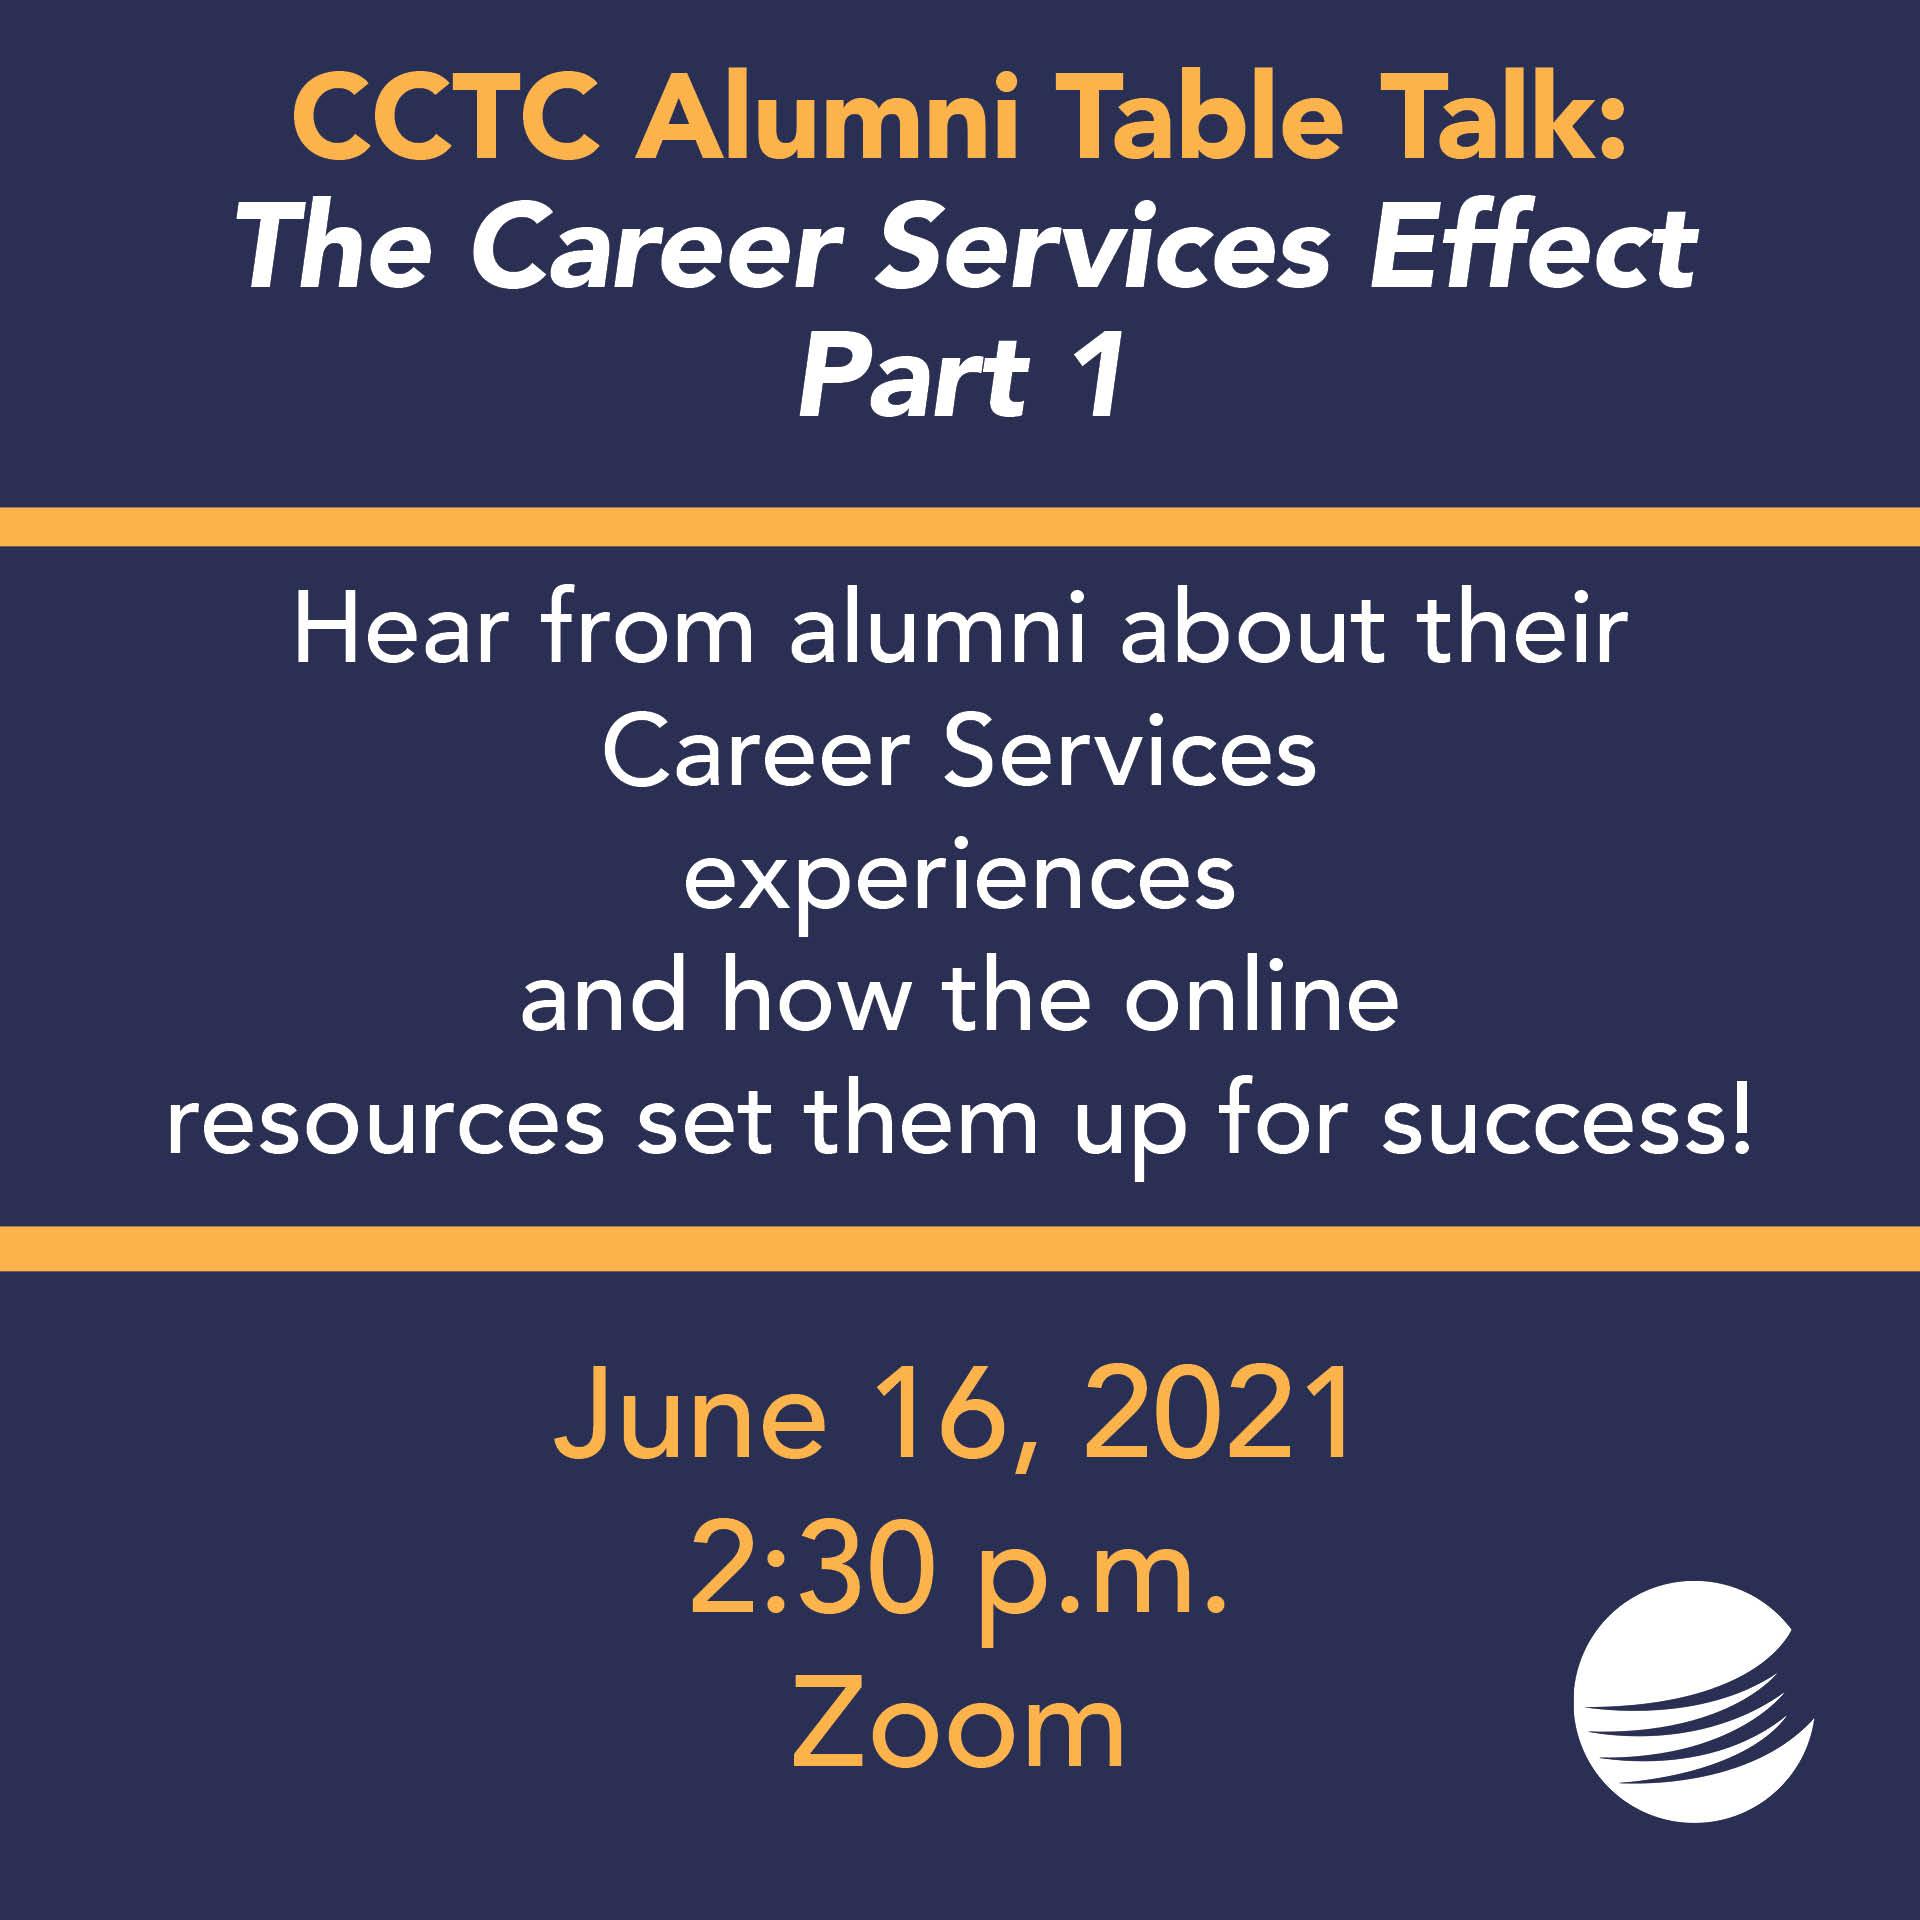 Alumni Table Talk